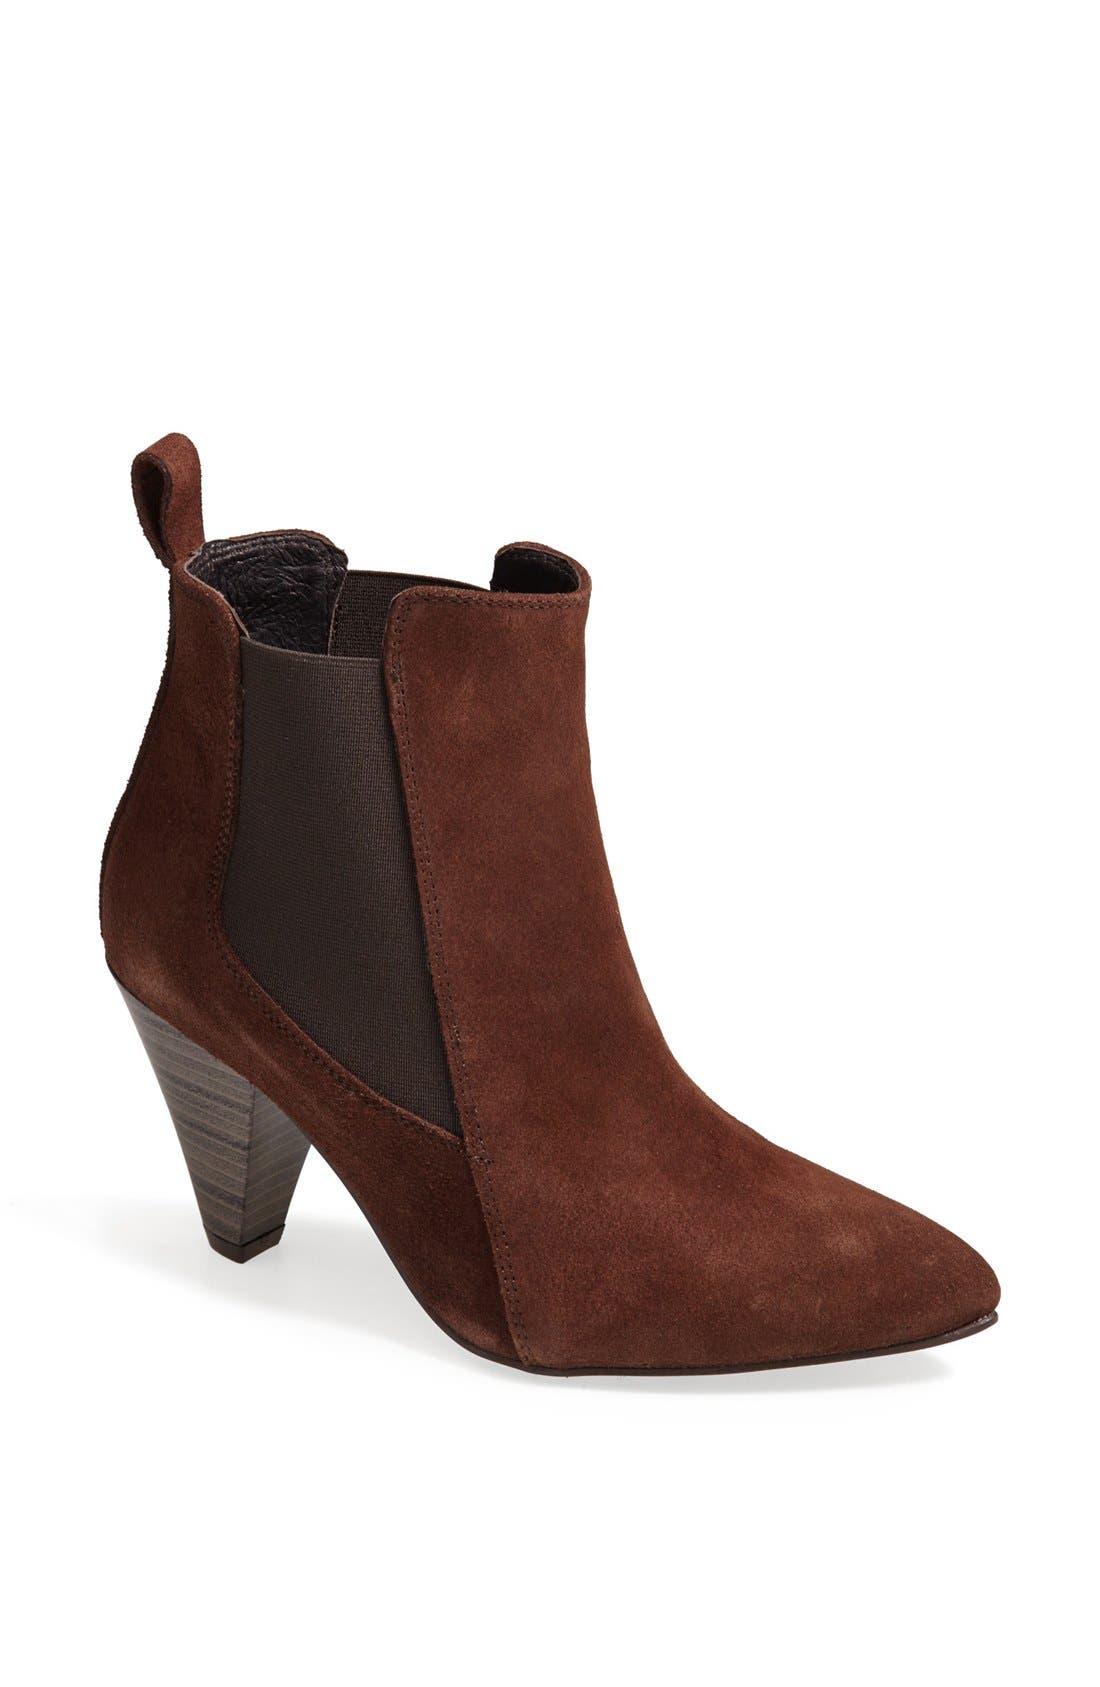 Alternate Image 1 Selected - Charles David 'Felisa' Leather Pointy Toe Bootie